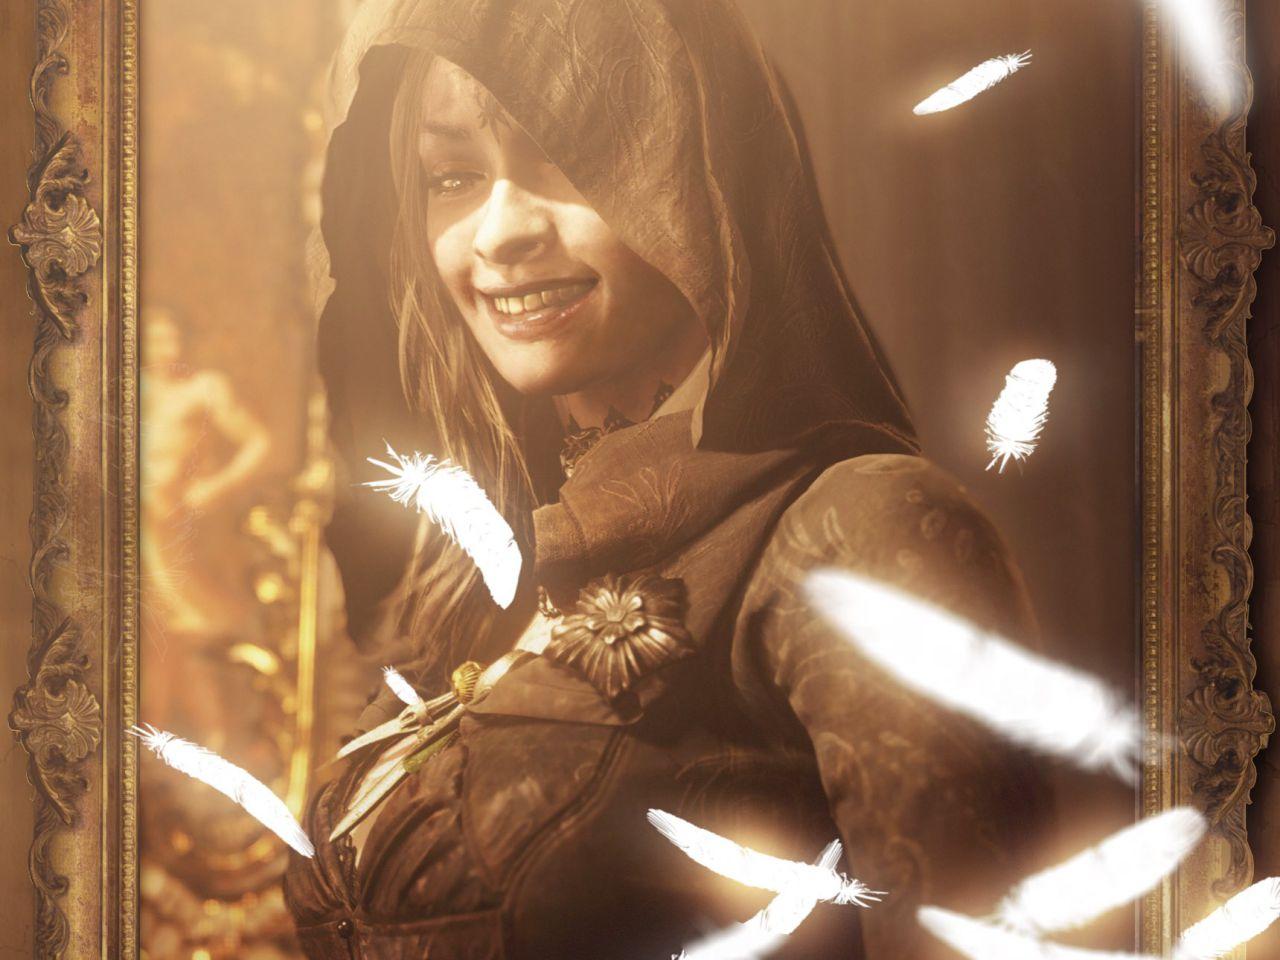 Morre atriz que fez as bruxas de Resident Evil Village 7